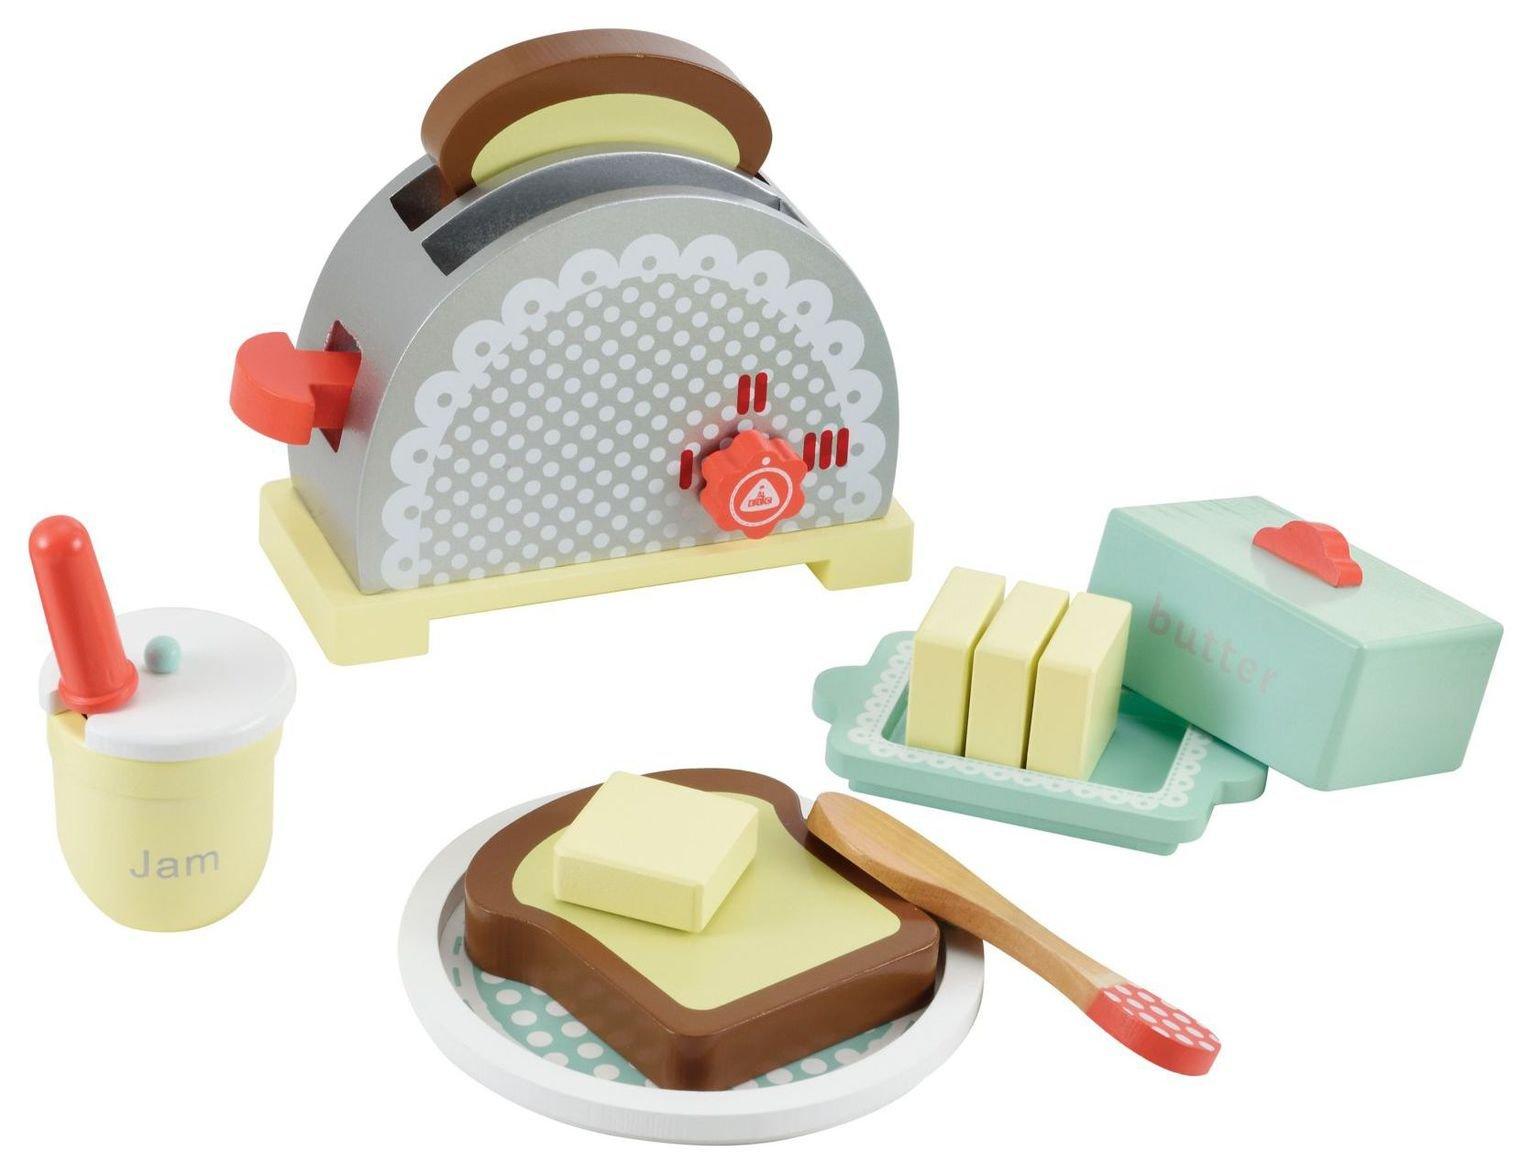 Buy Elc Wooden Toaster Set Wooden Toys Argos